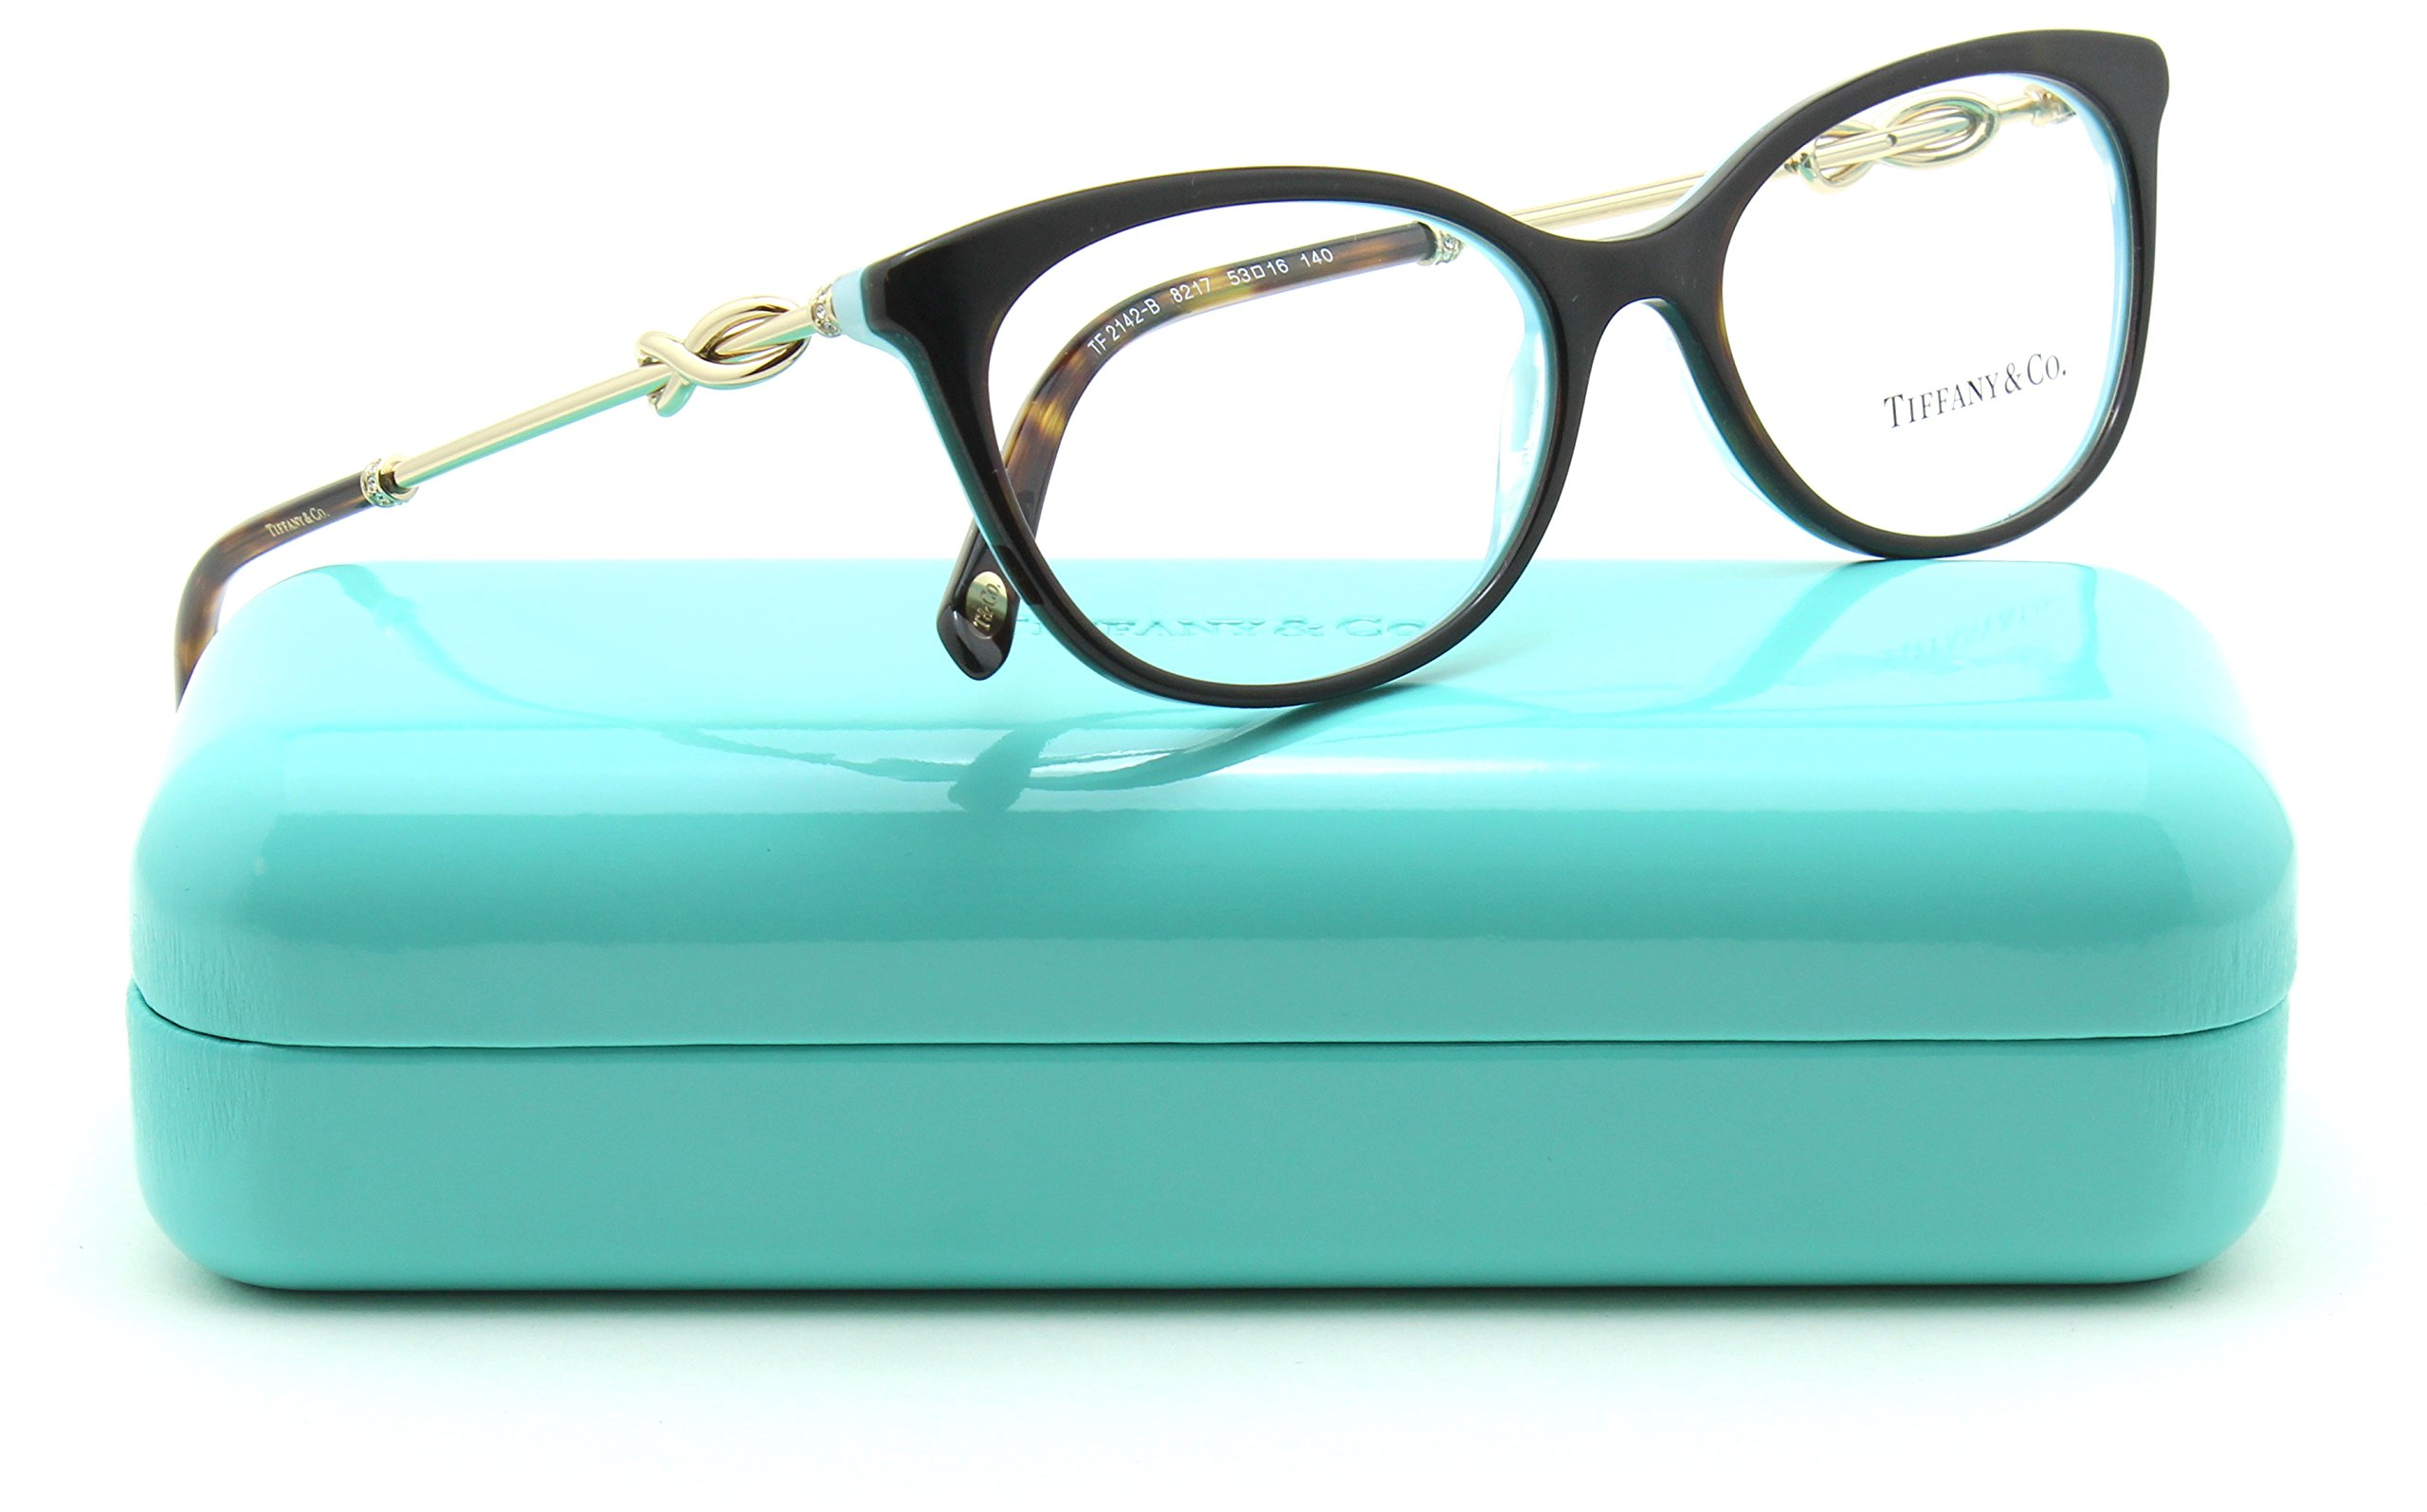 Tiffany & Co. TF 2142-B Women Eyeglasses RX - able Frame (HAVANA/STRIPED BLUE 8217, 51)